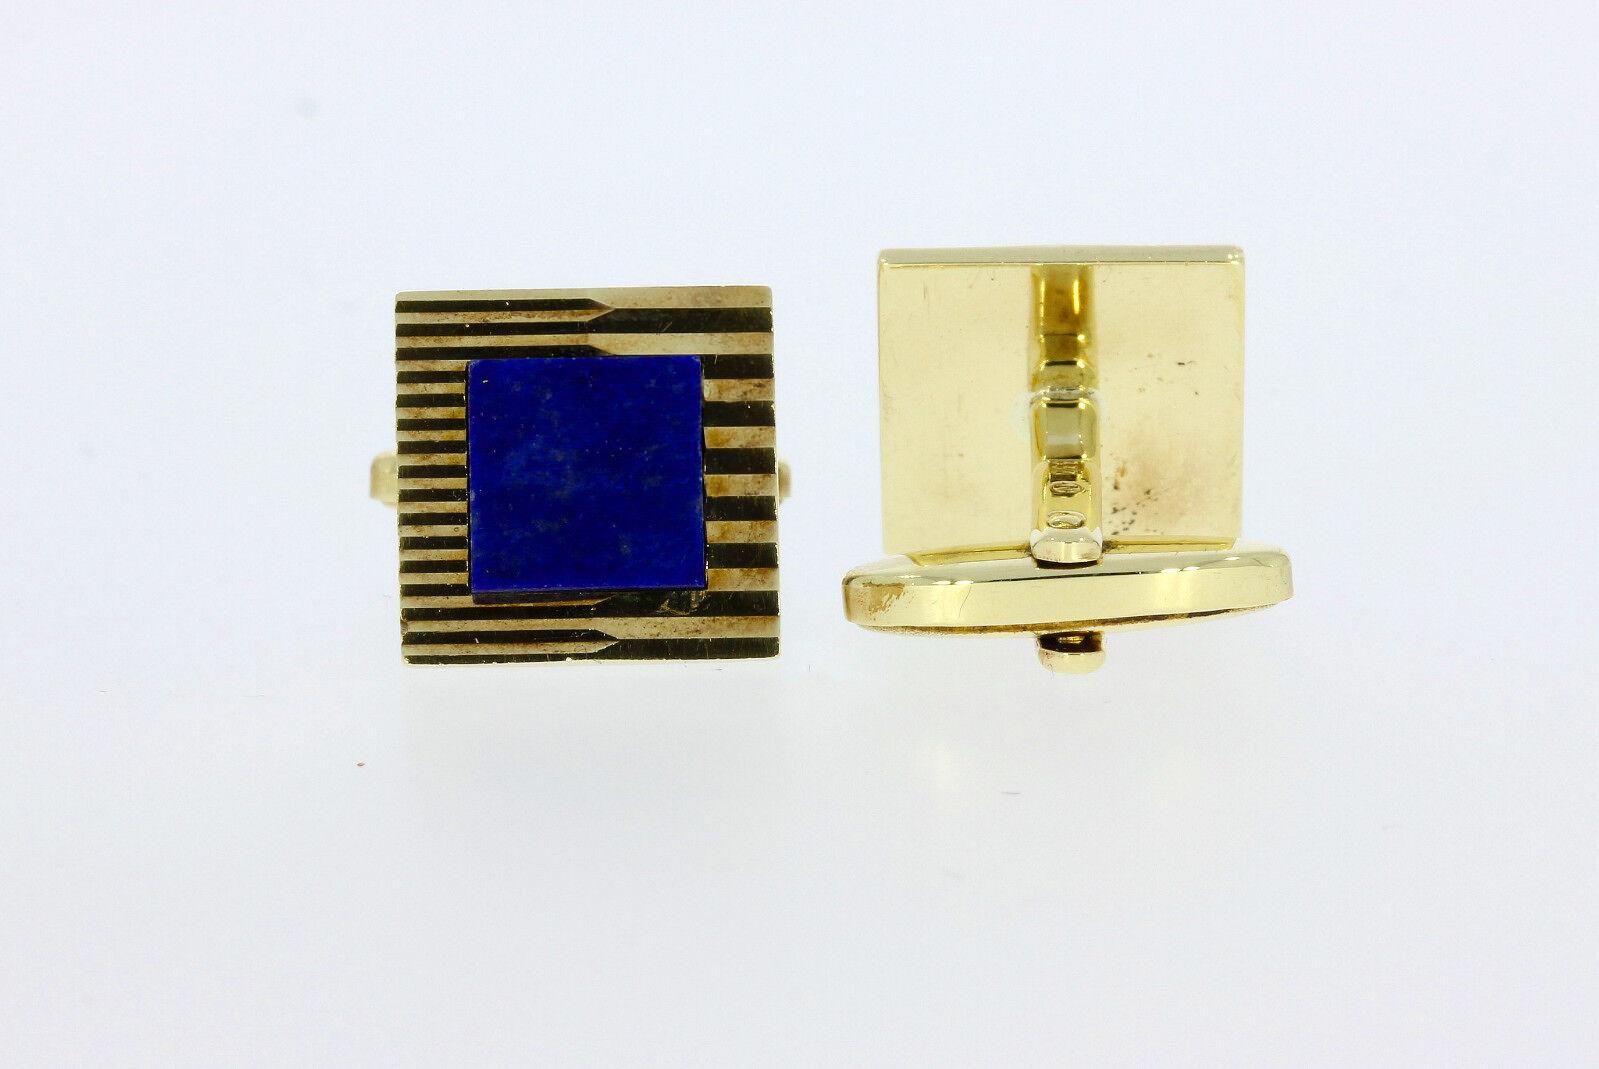 7800-333er GIALLO GEMELLI GEMELLI GEMELLI CON LAPISLbluI peso 11 53 grammi f87ac8